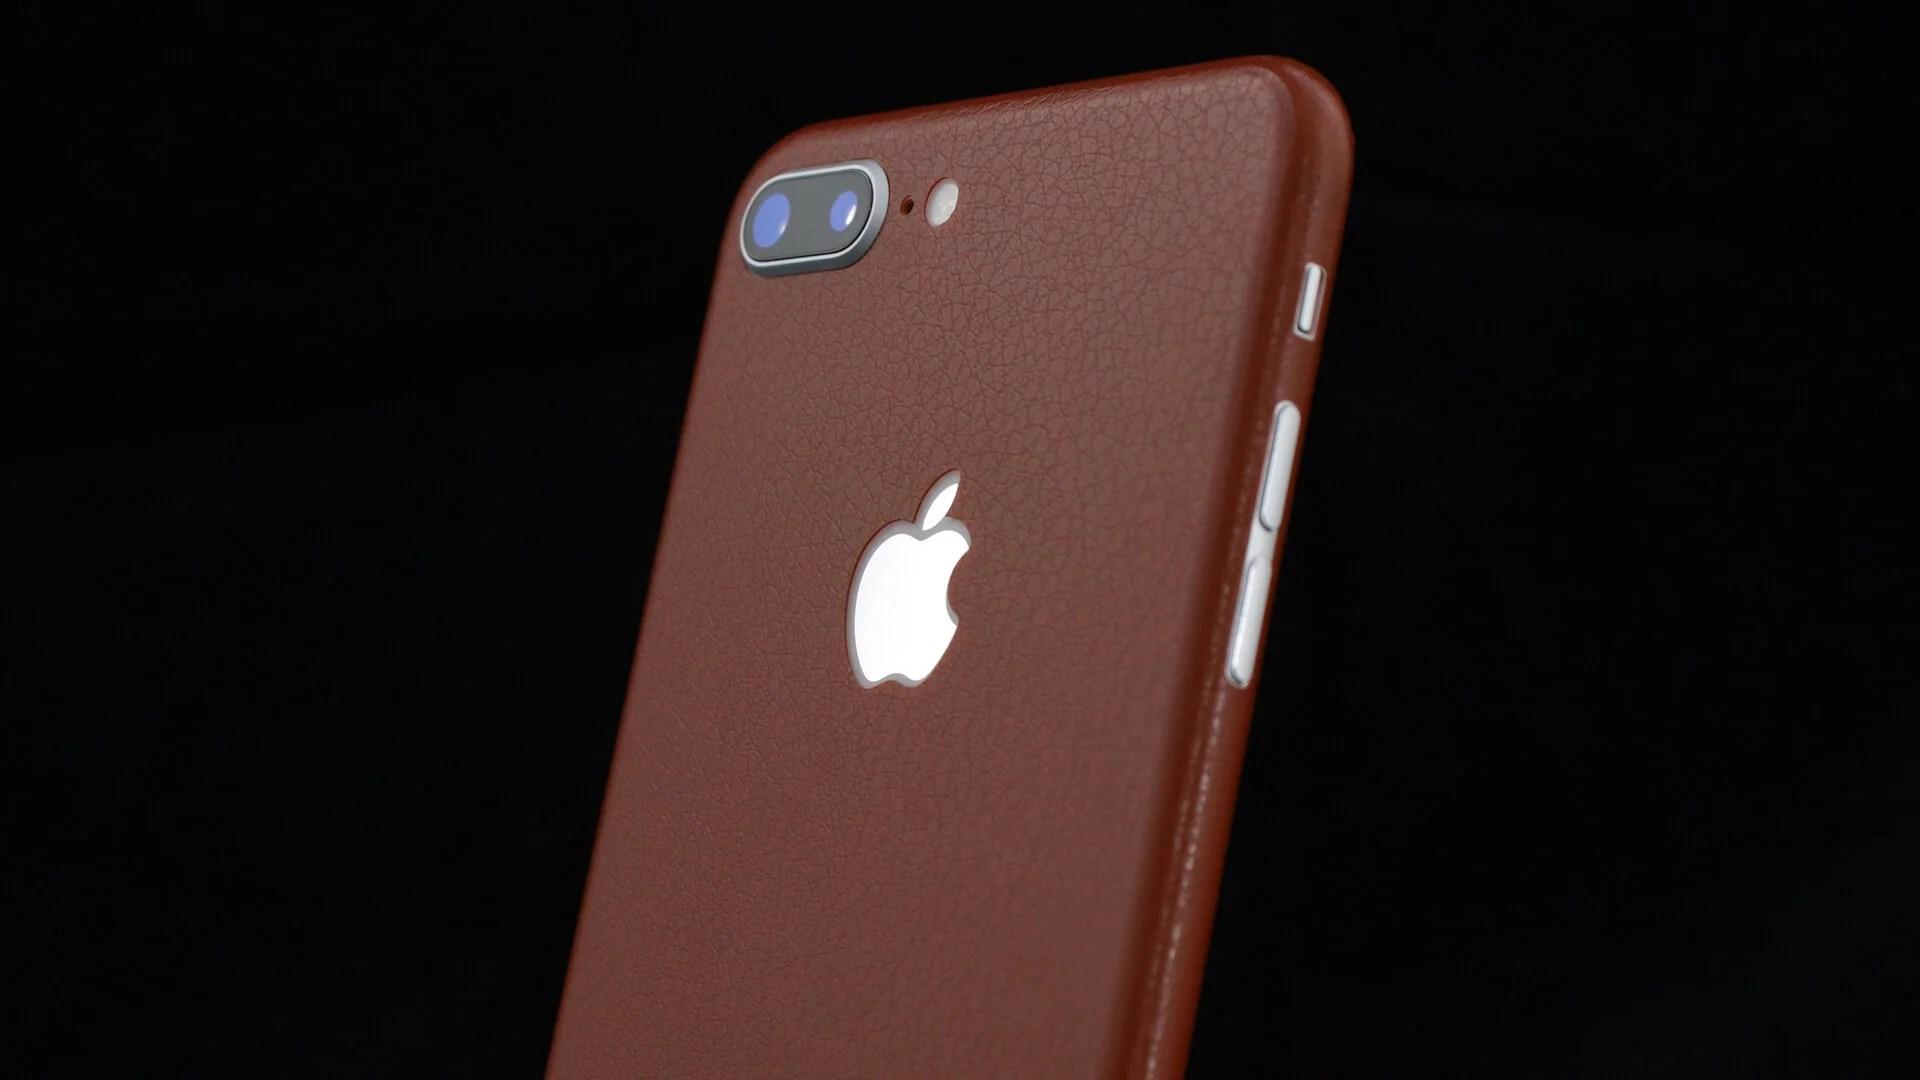 Carbon Fibre Iphone X Wallpaper Iphone 8 Plus Skins And Wraps Custom Phone Skins